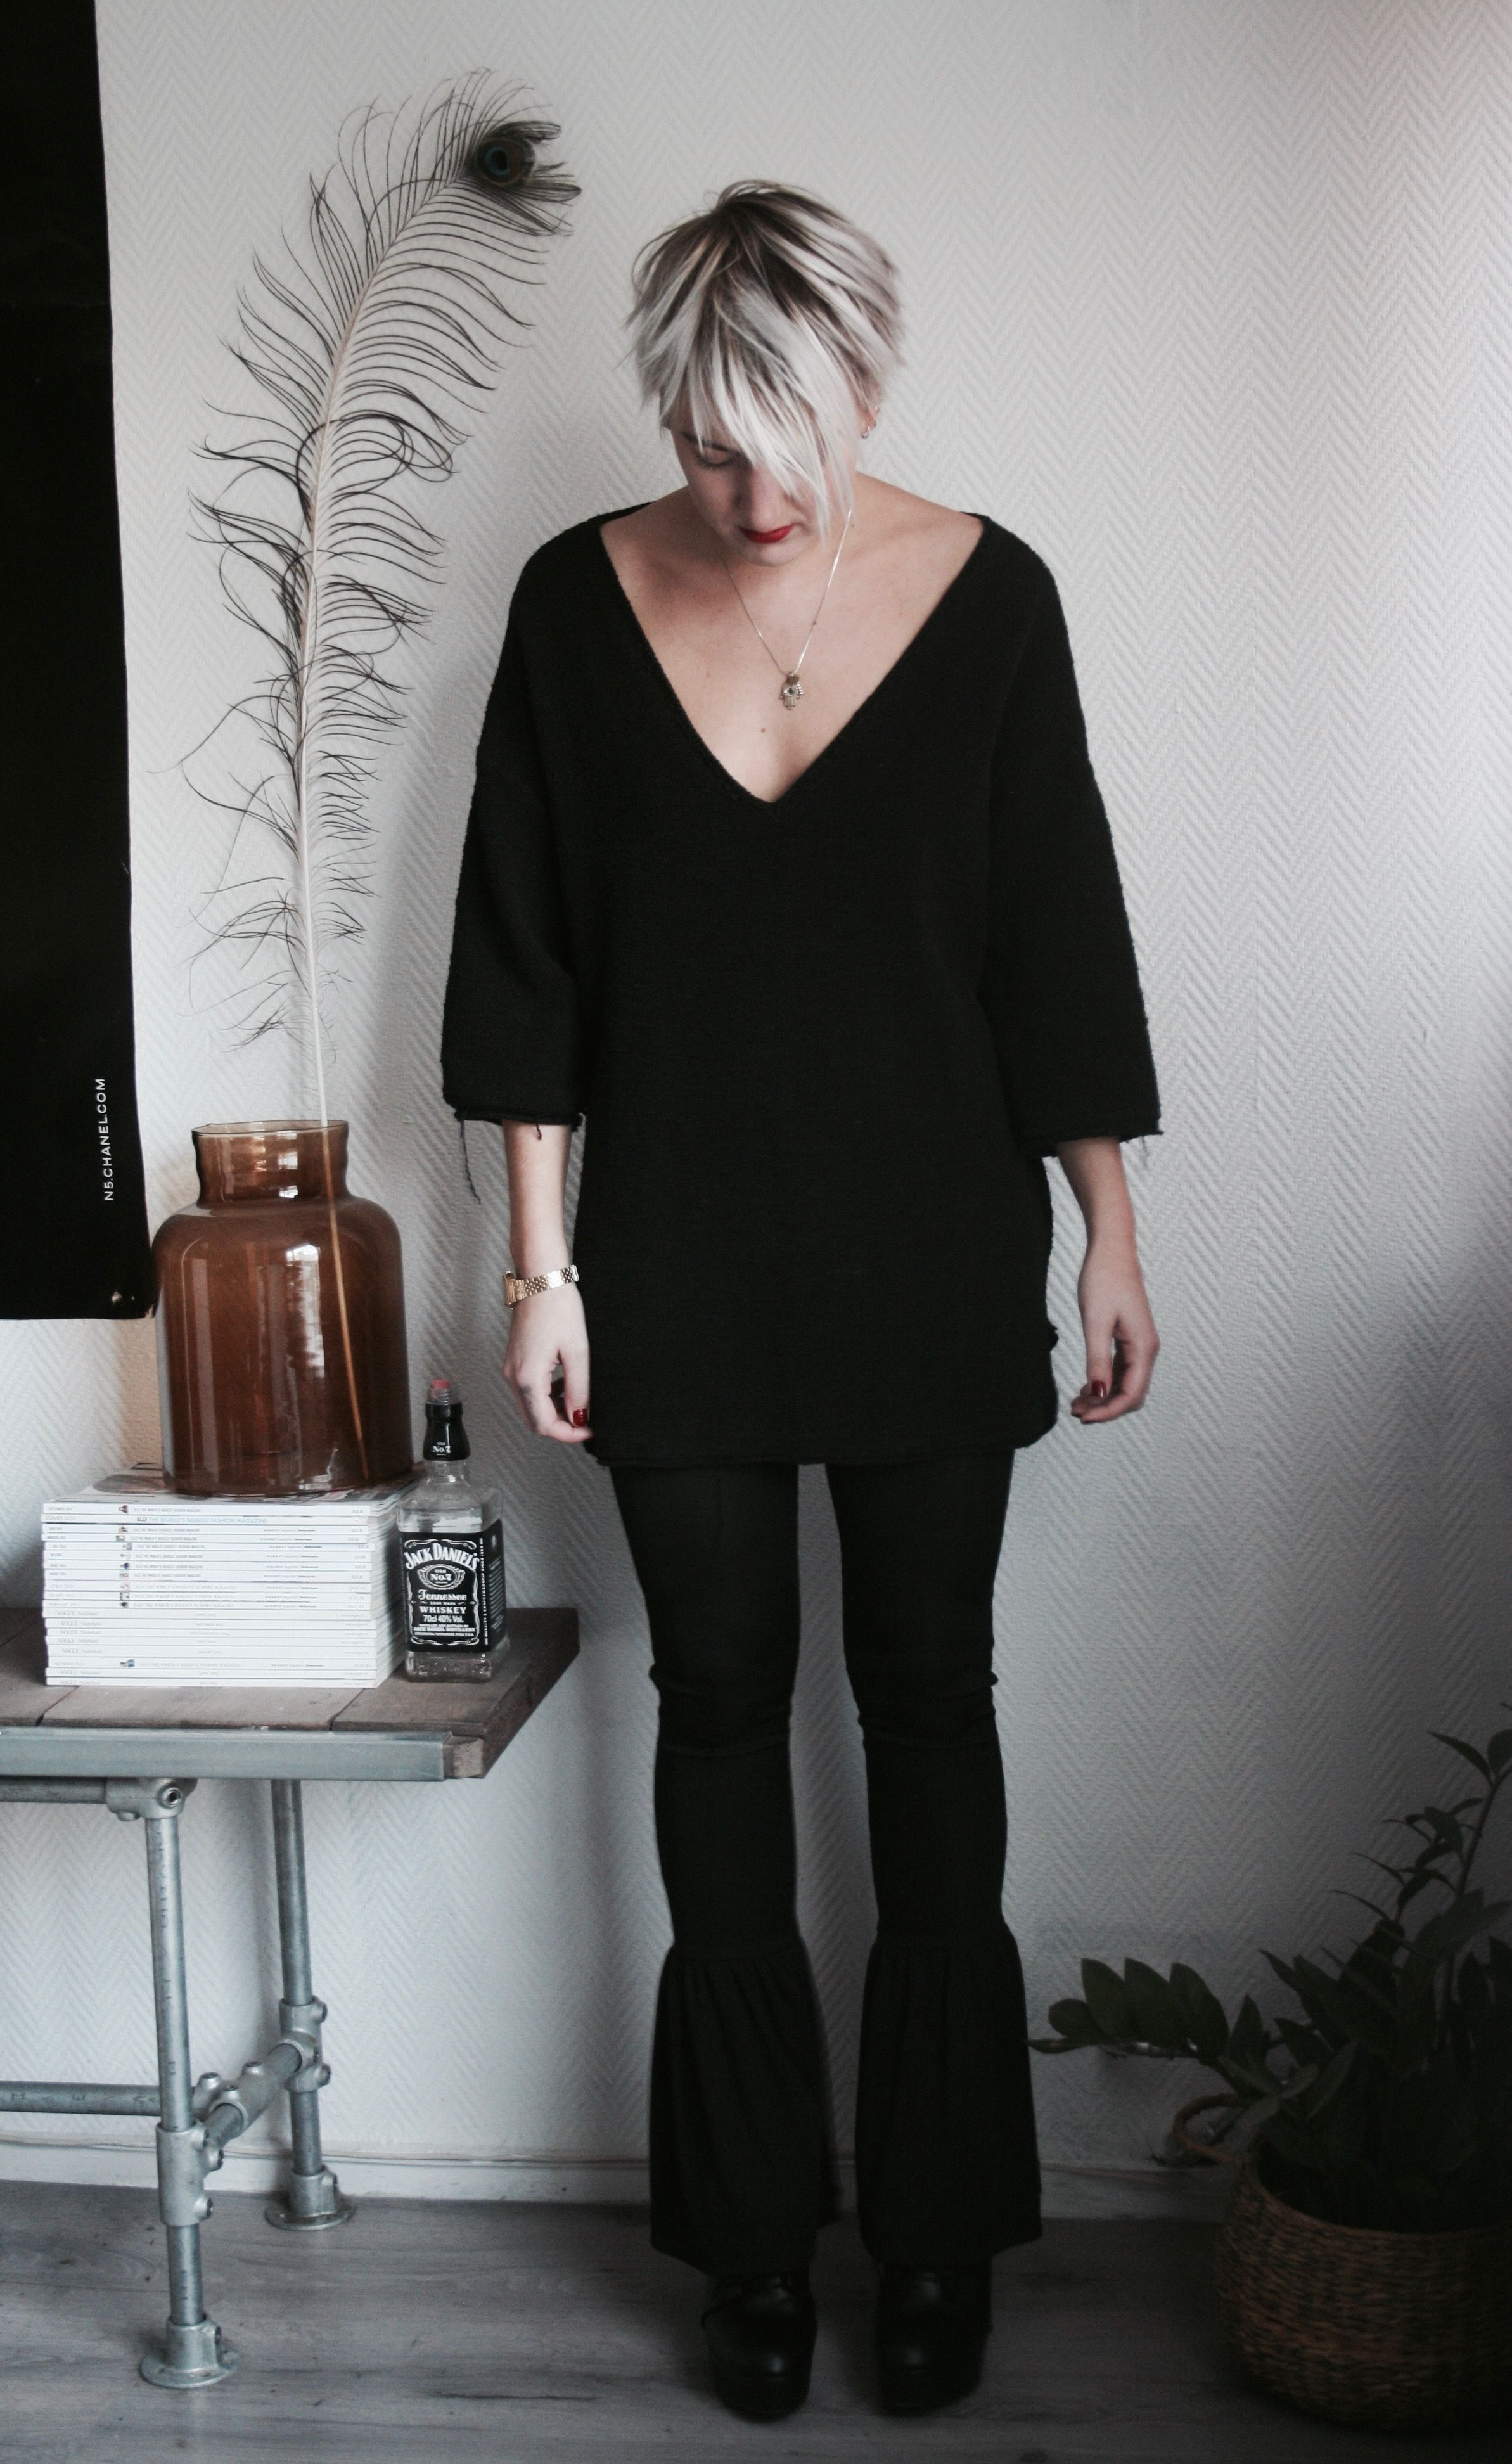 high waist legging volant zara bell bottom flared pants knit shirt interior